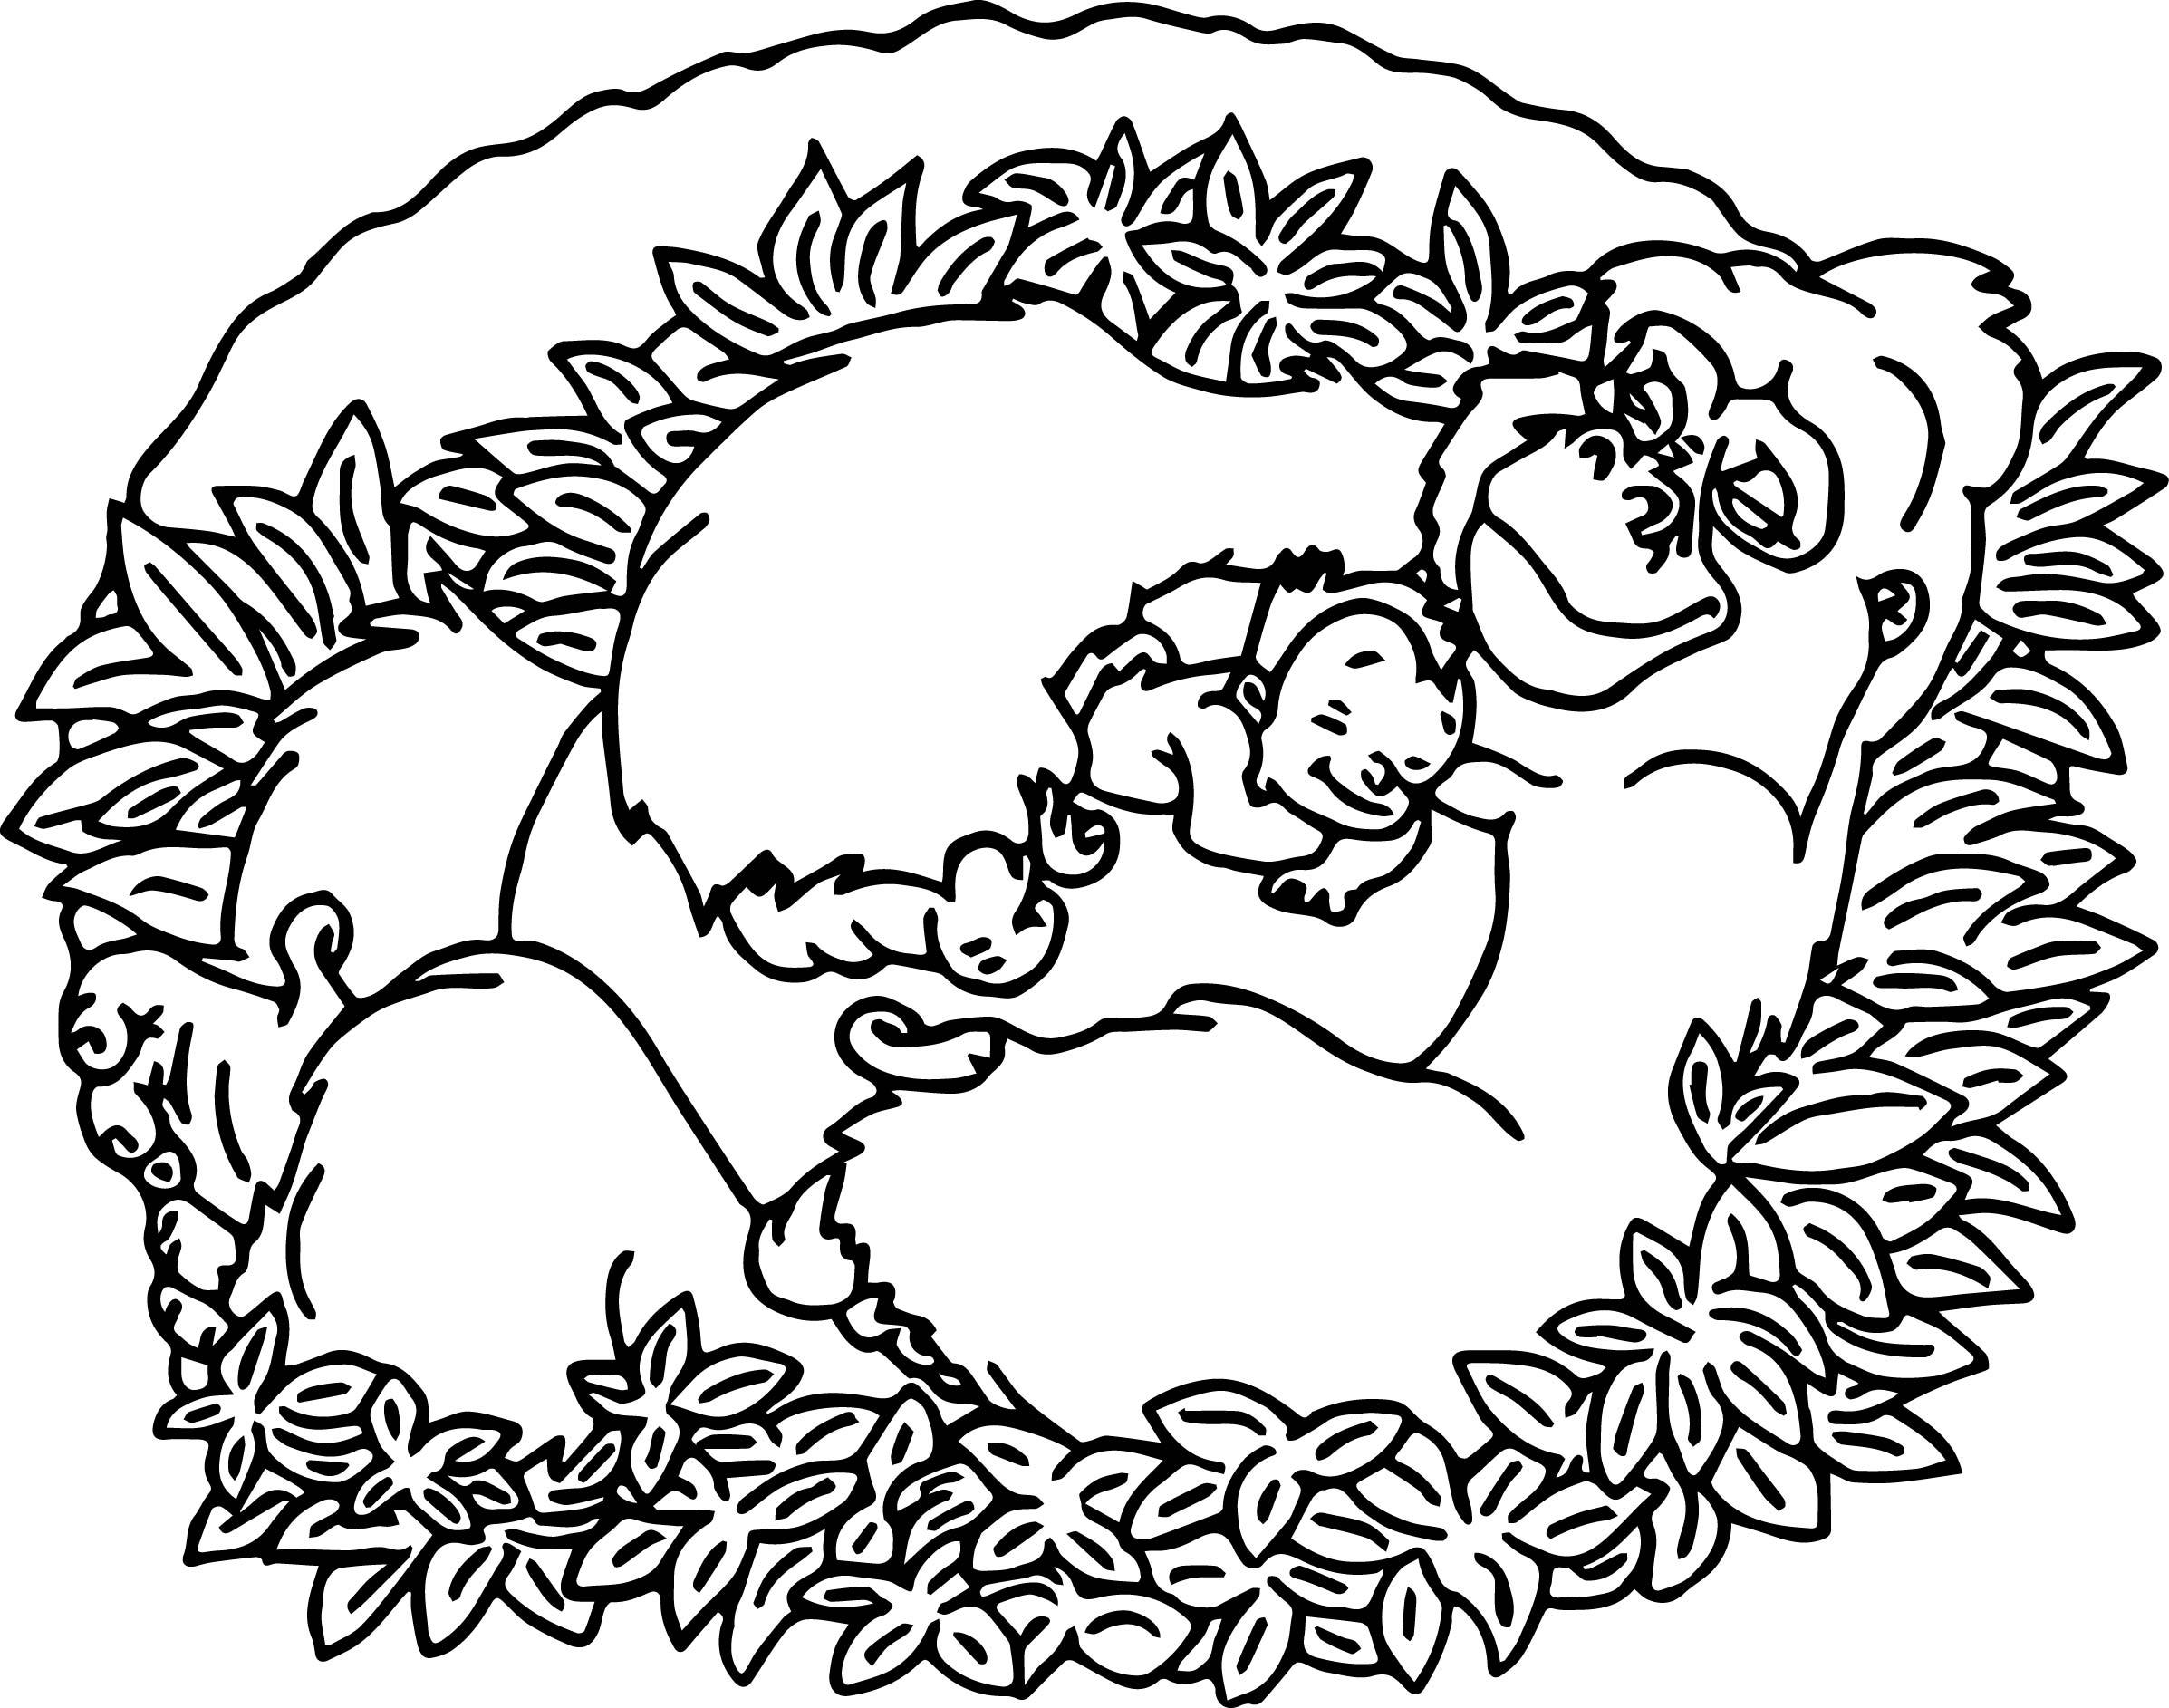 Disney Baby Tarzan Sleep Coloring Page | Wecoloringpage